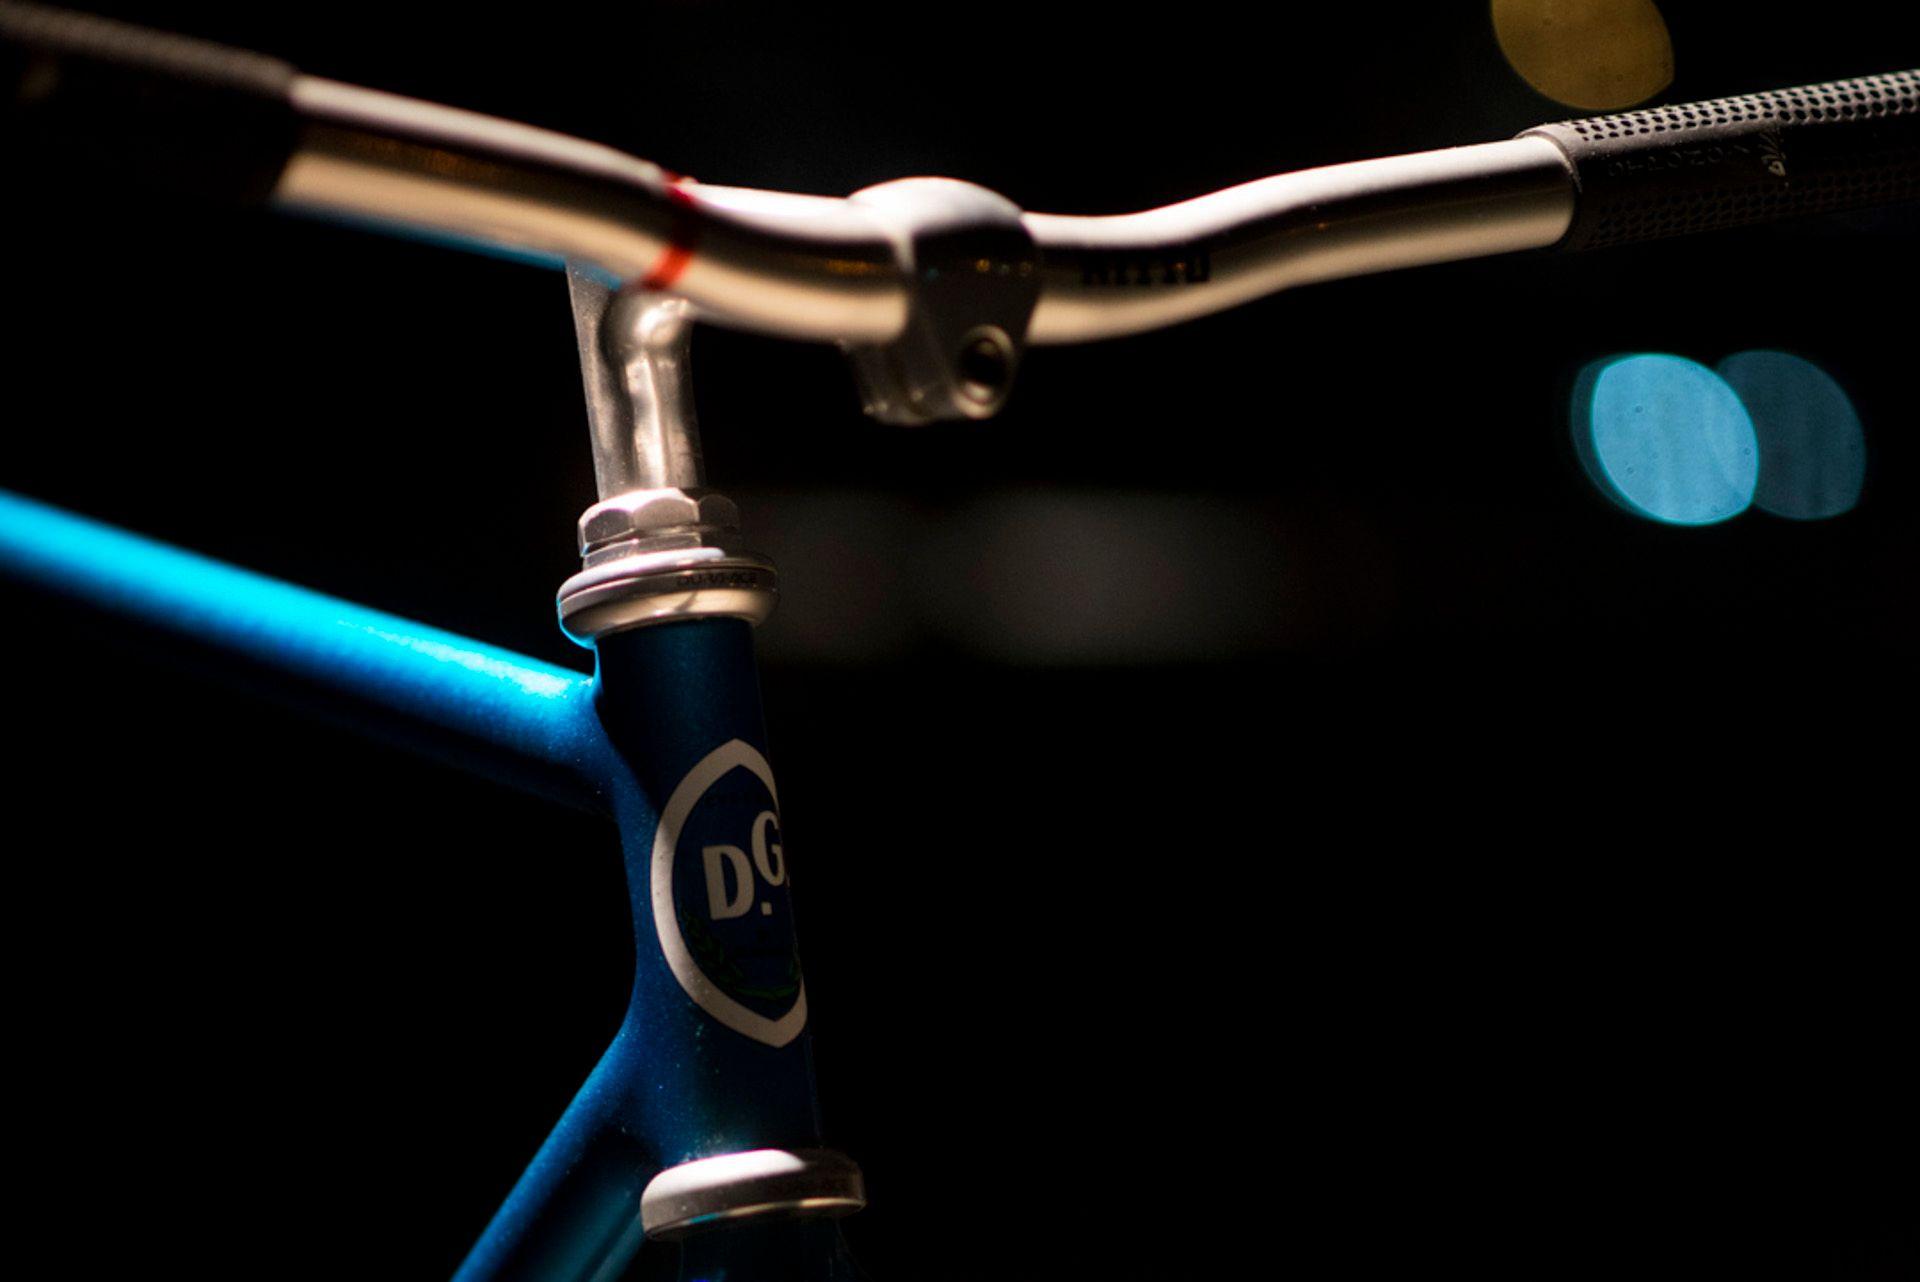 D.GUEDON track bike